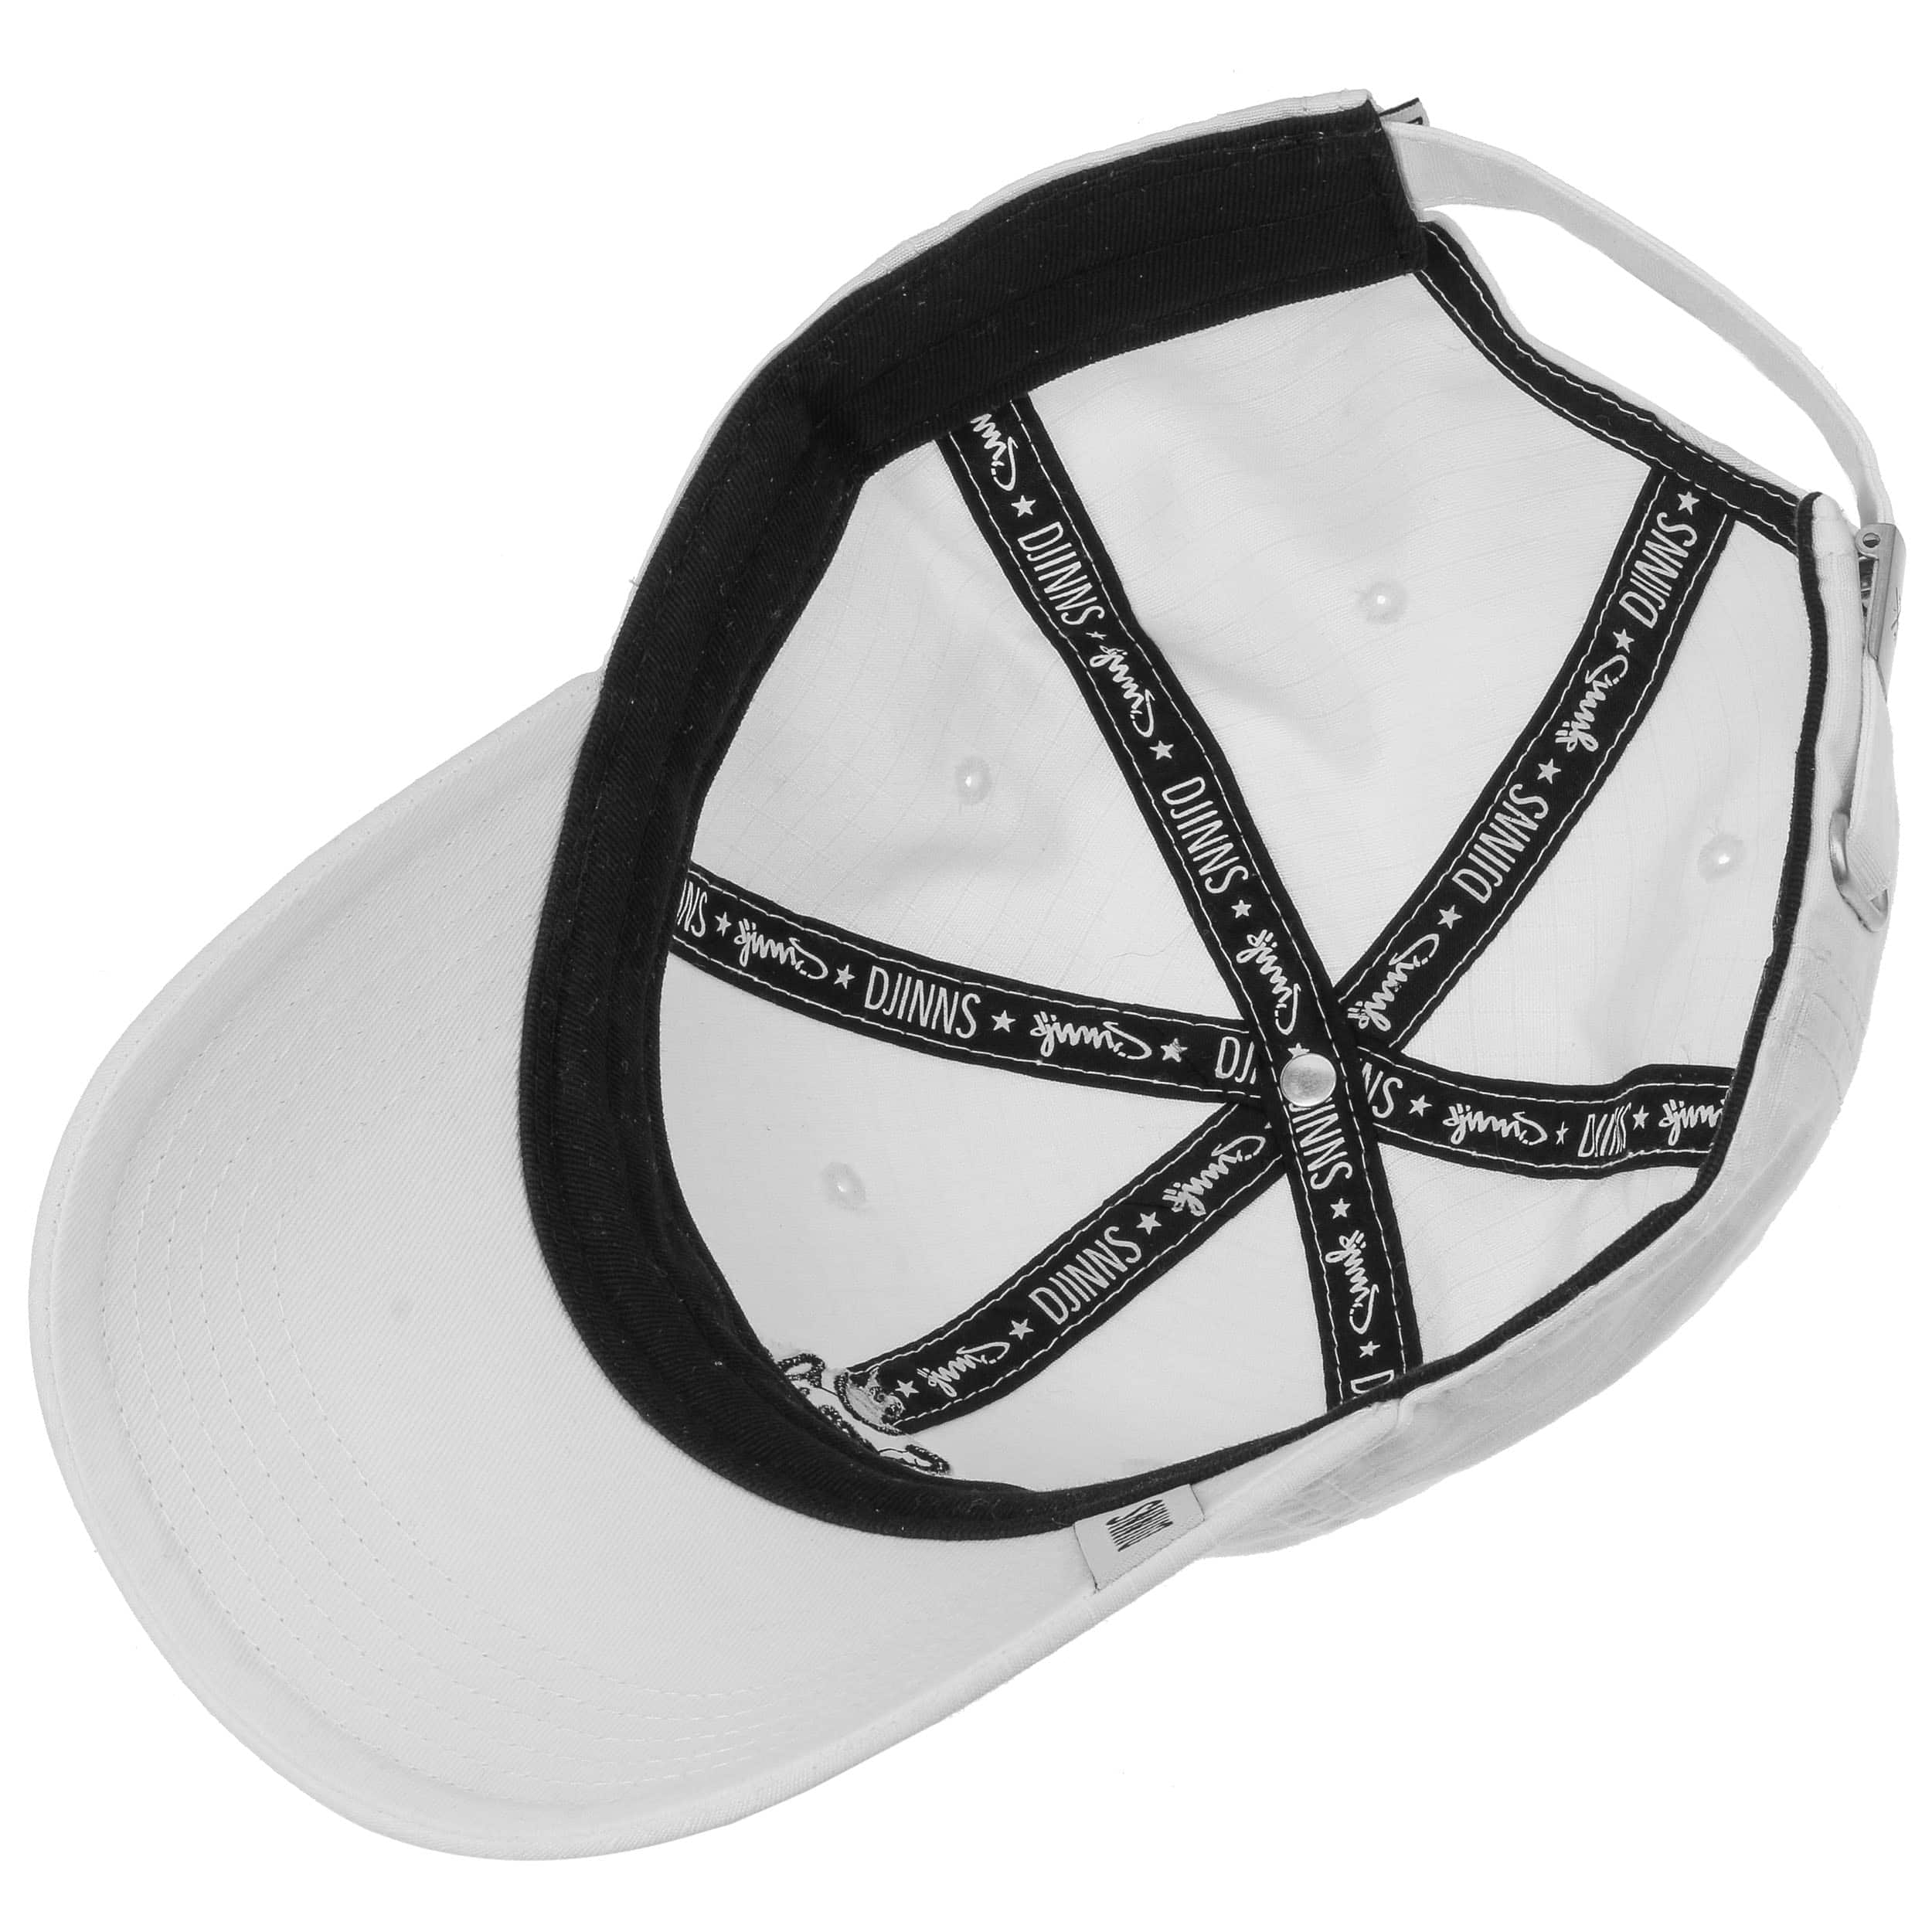 ribstop 6p cv strapback cap by djinns